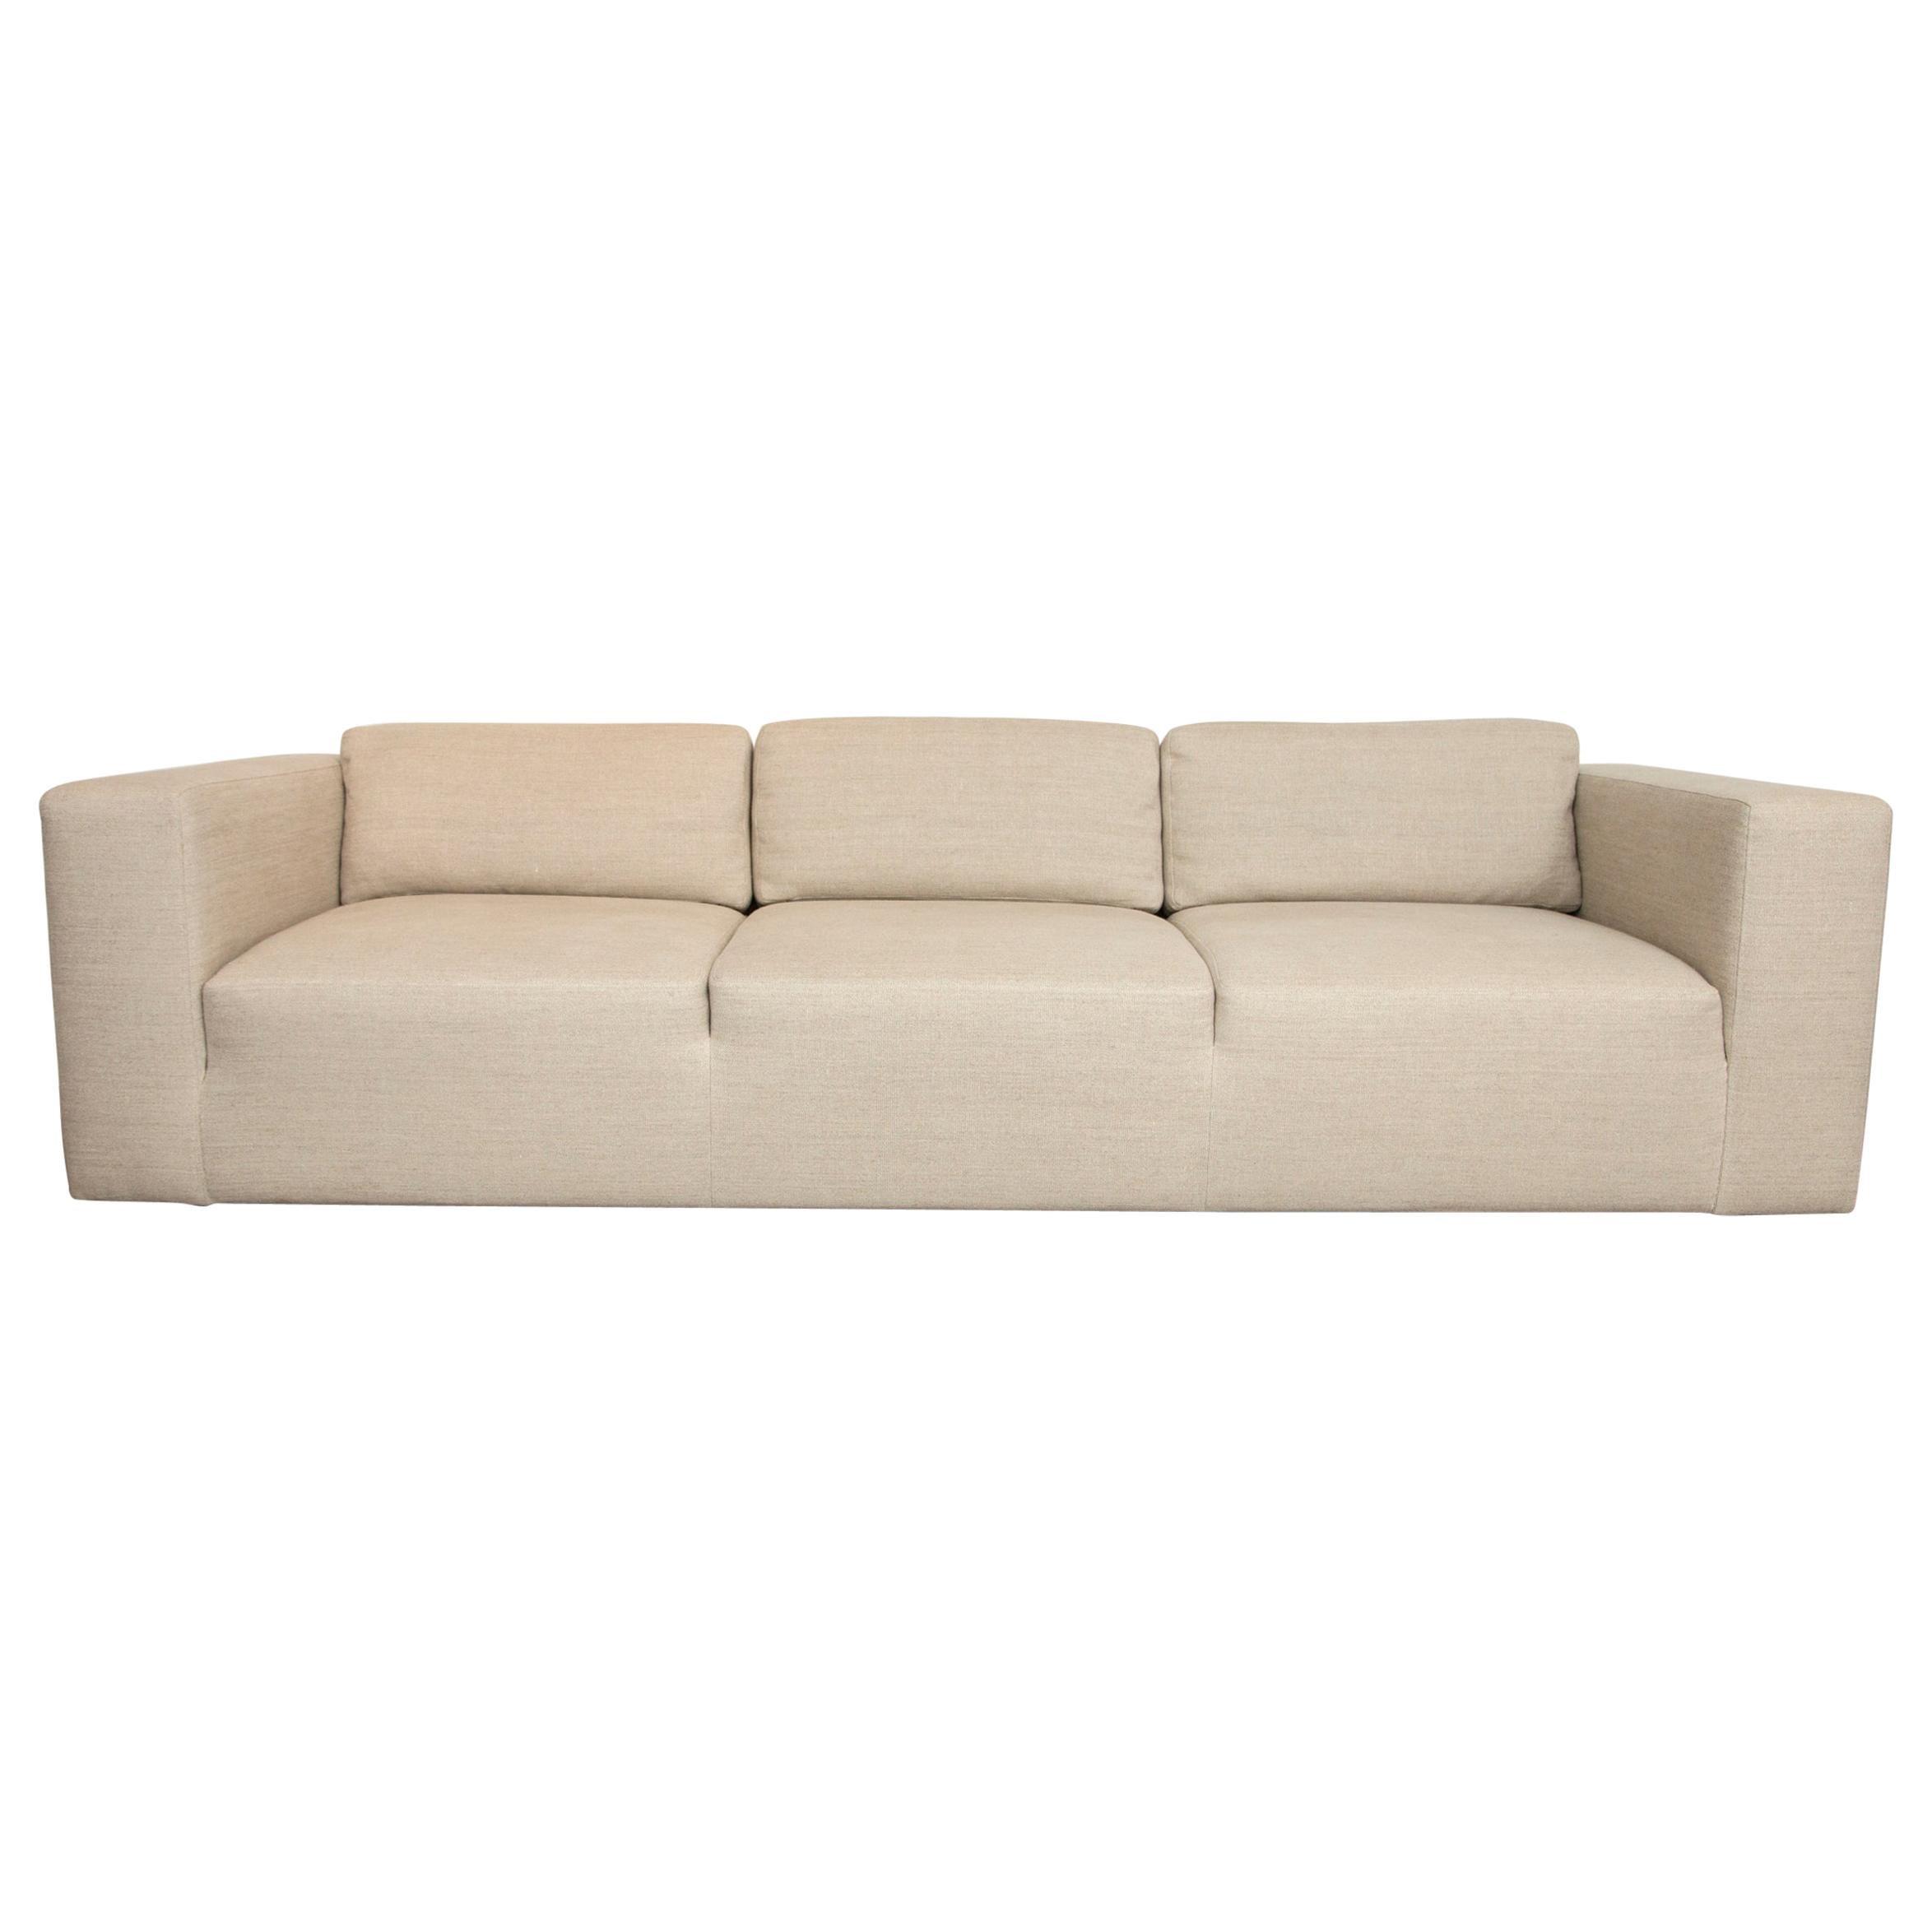 Mid-Century Modern Sofa Redone in Flax Belgian Linen